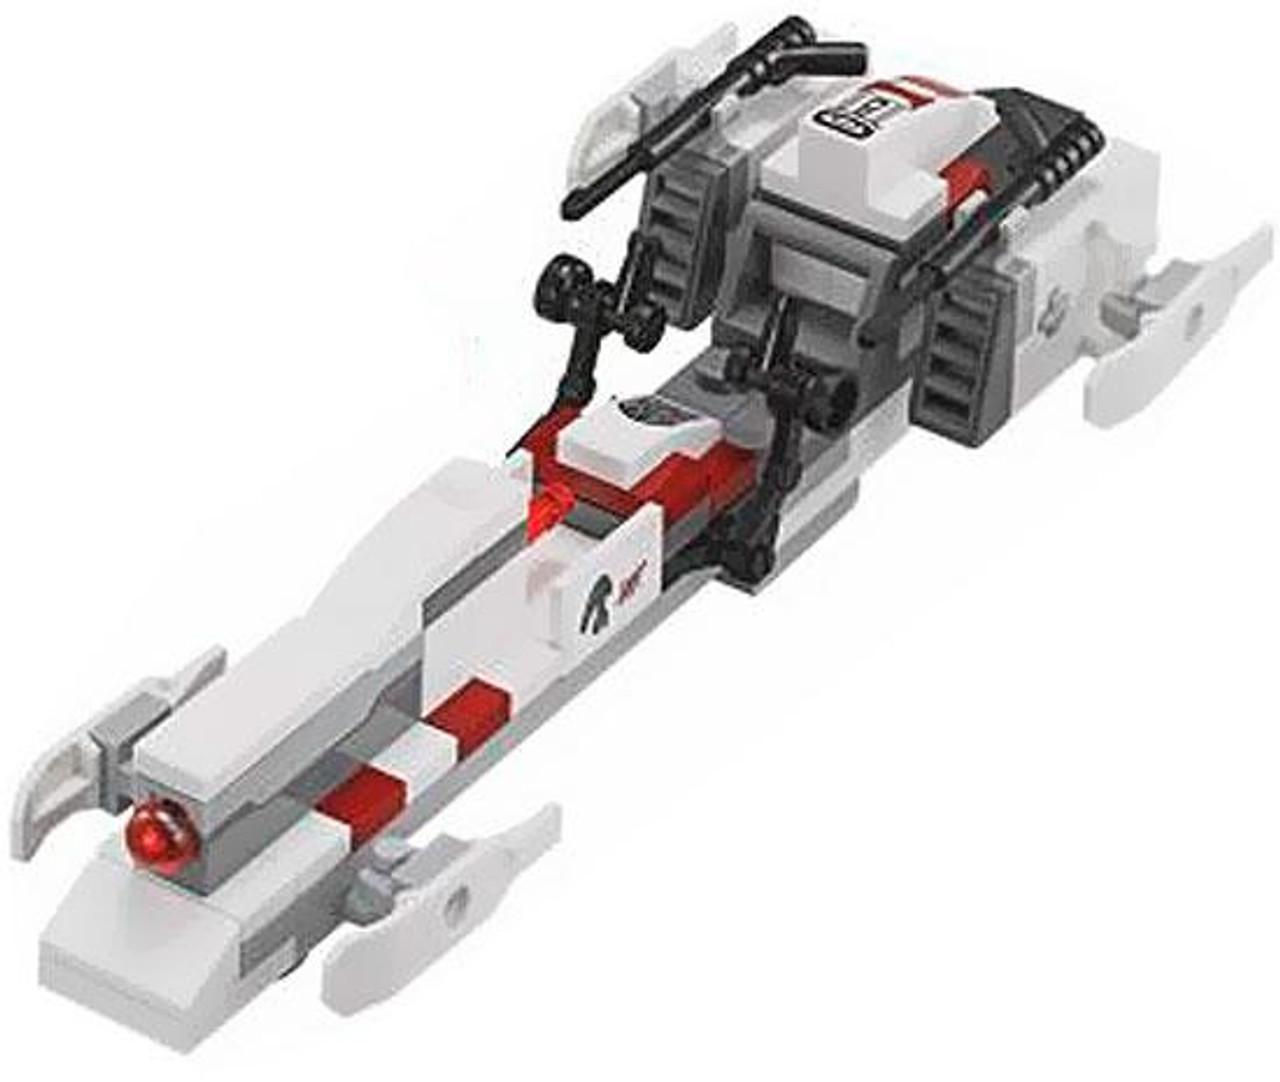 lego barc speeder instructions